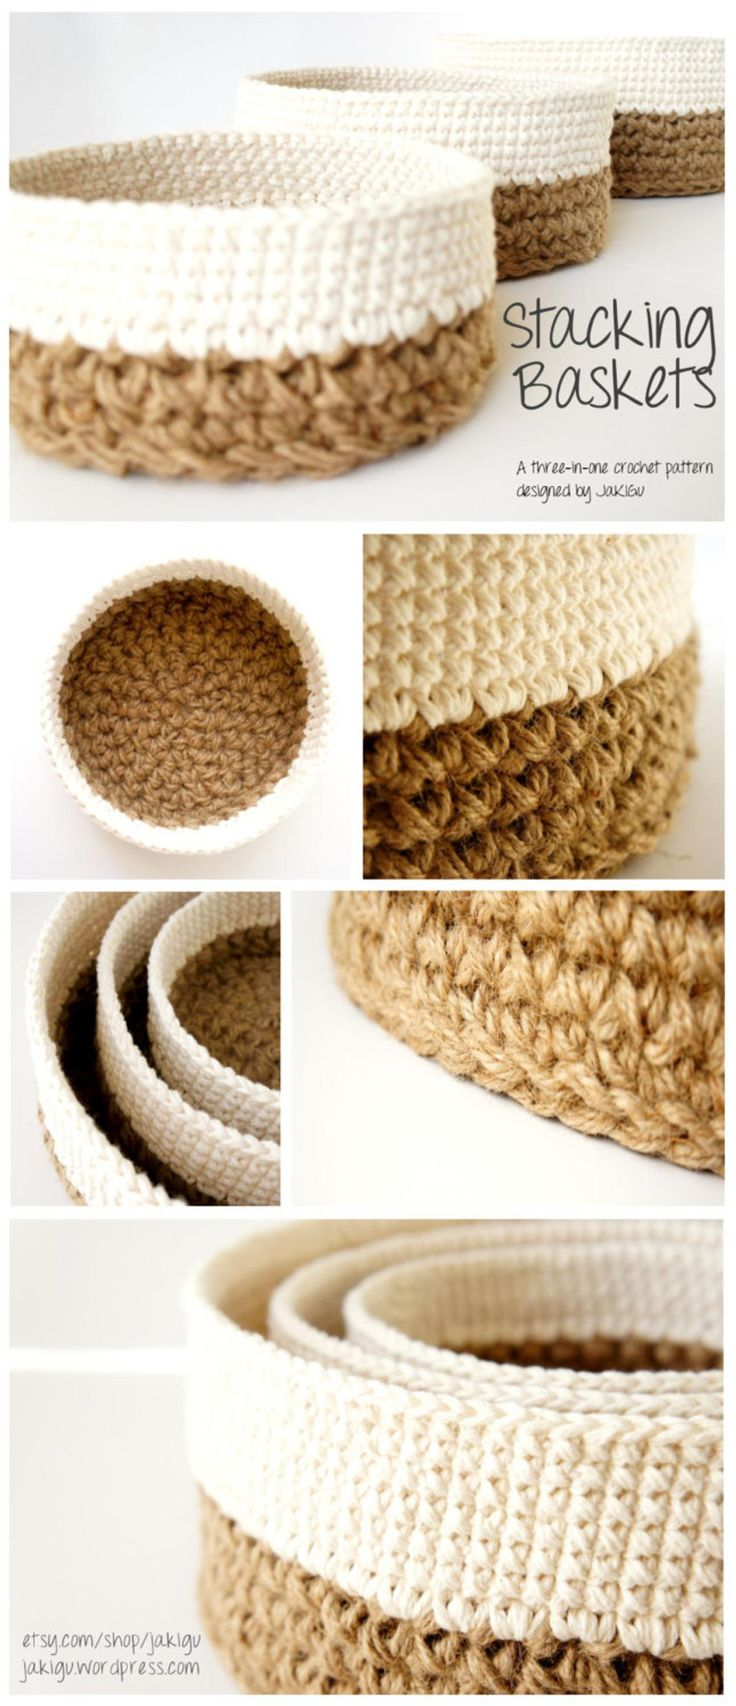 Stacking Baskets – 3 PDF Crochet Patterns – Jute and Cotton Nesting Bowls – Natural Materials – JaKiGu Pattern 301